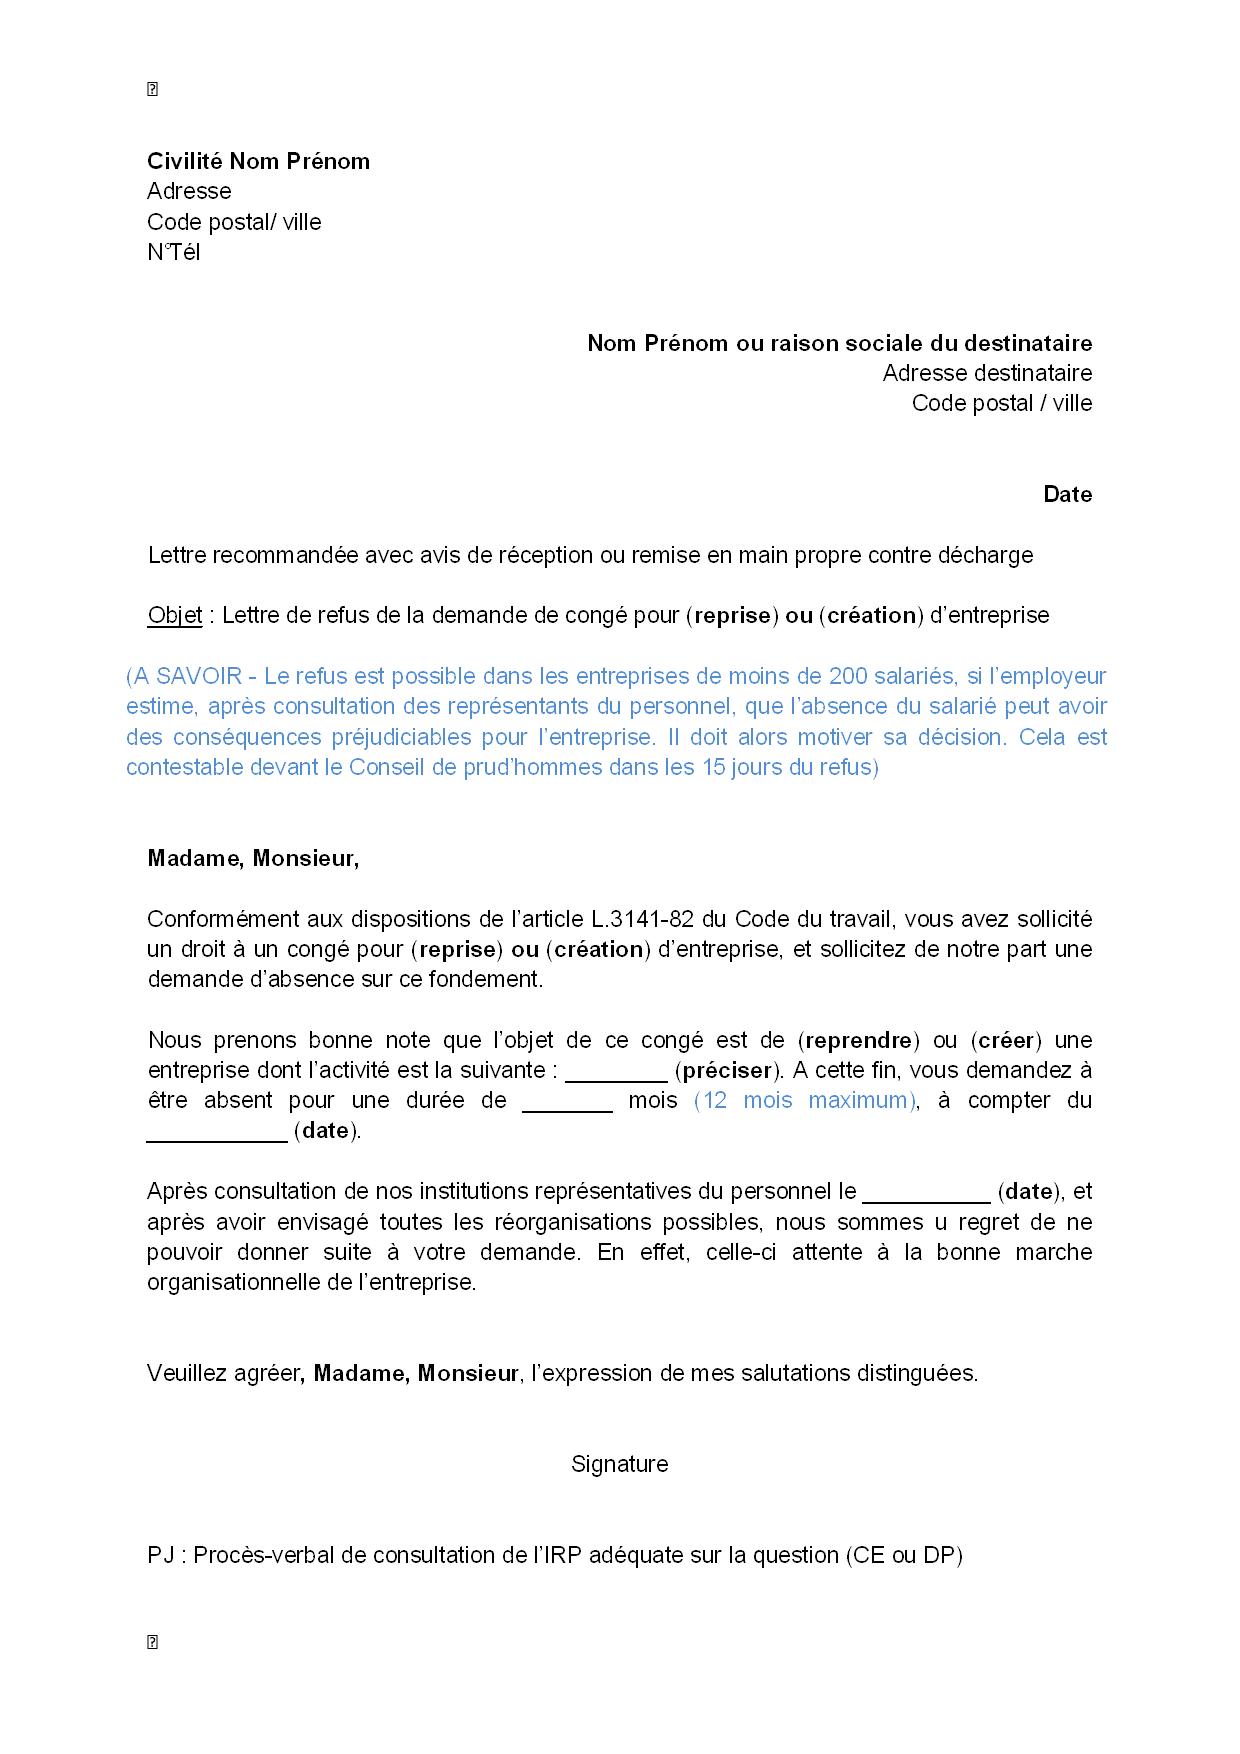 lettre de refus  par l u0026 39 employeur  de la demande du salari u00e9